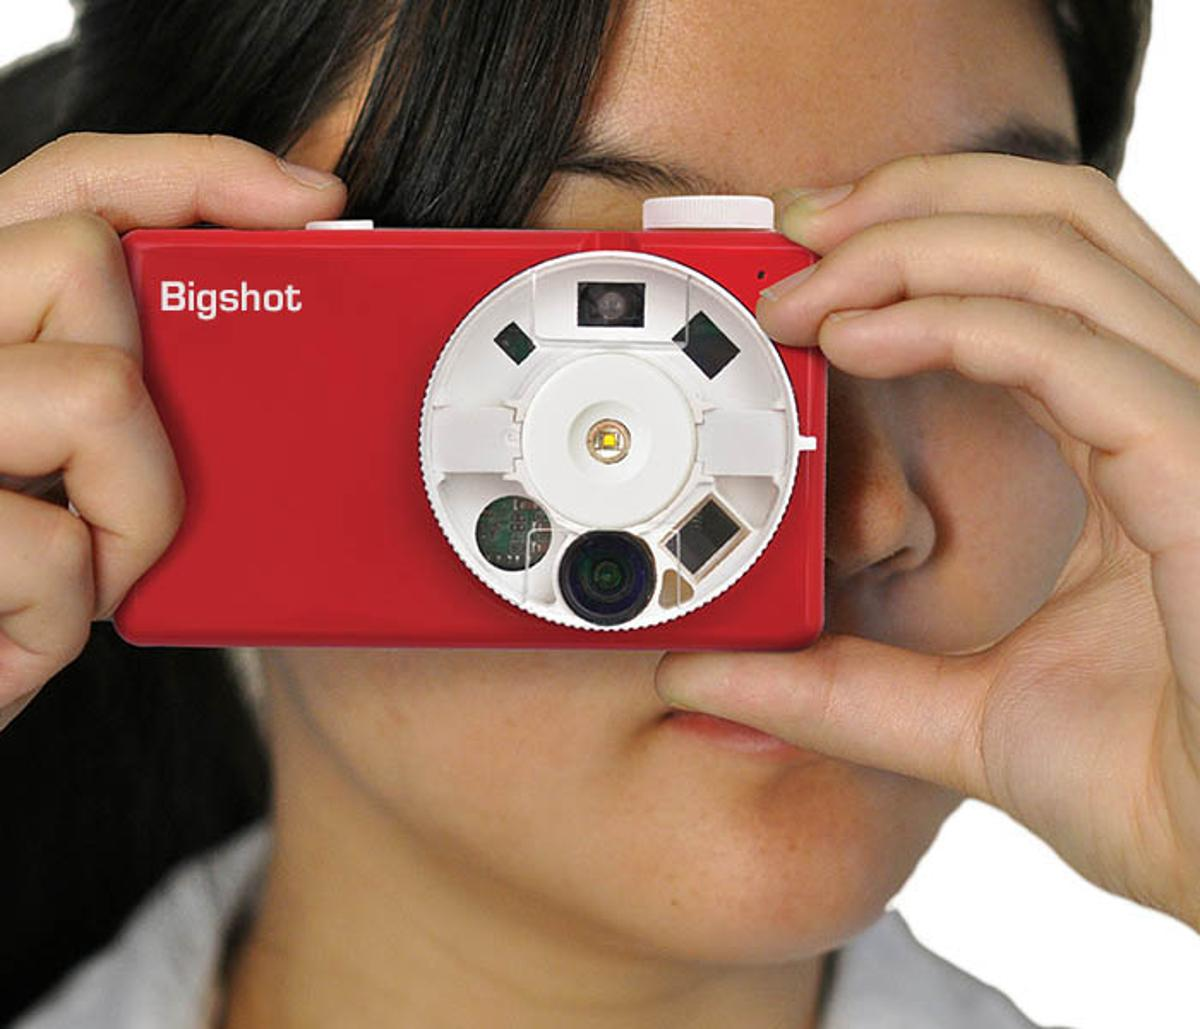 The Bigshot DIY camera kit from Kimera LLC